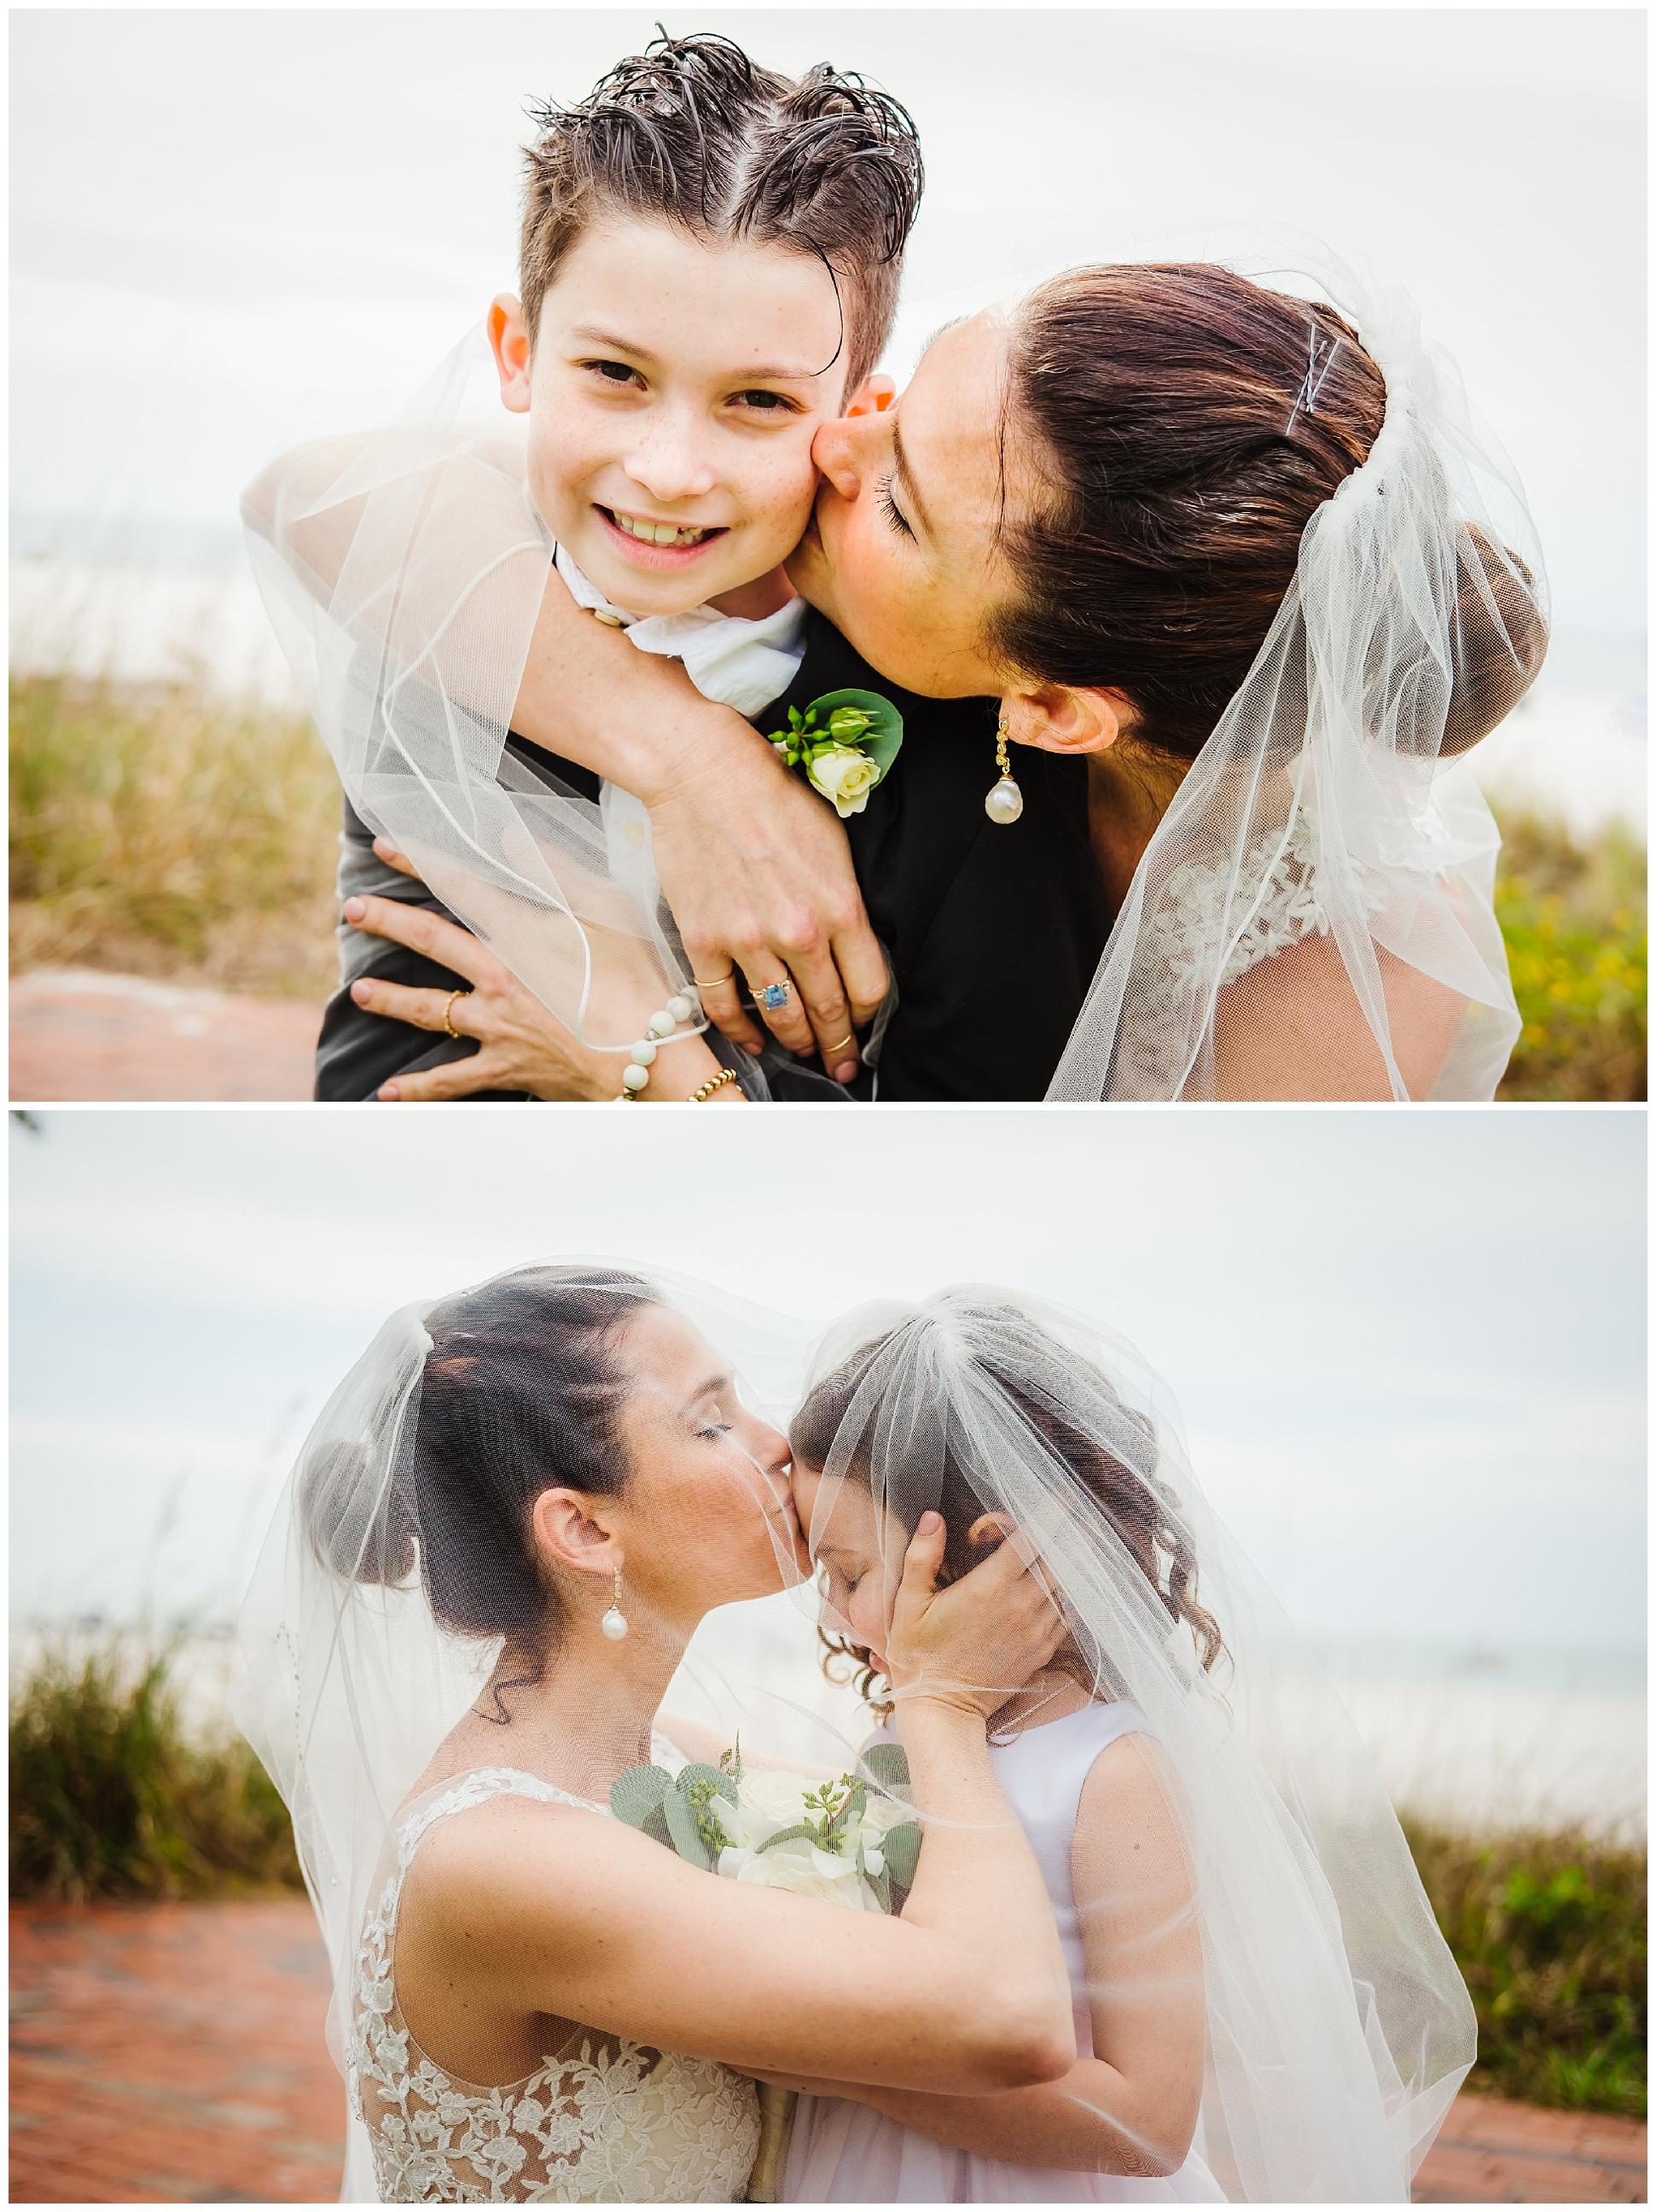 tampa-wedding-photographer-tradewinds-beach-family-elopement_0107.jpg